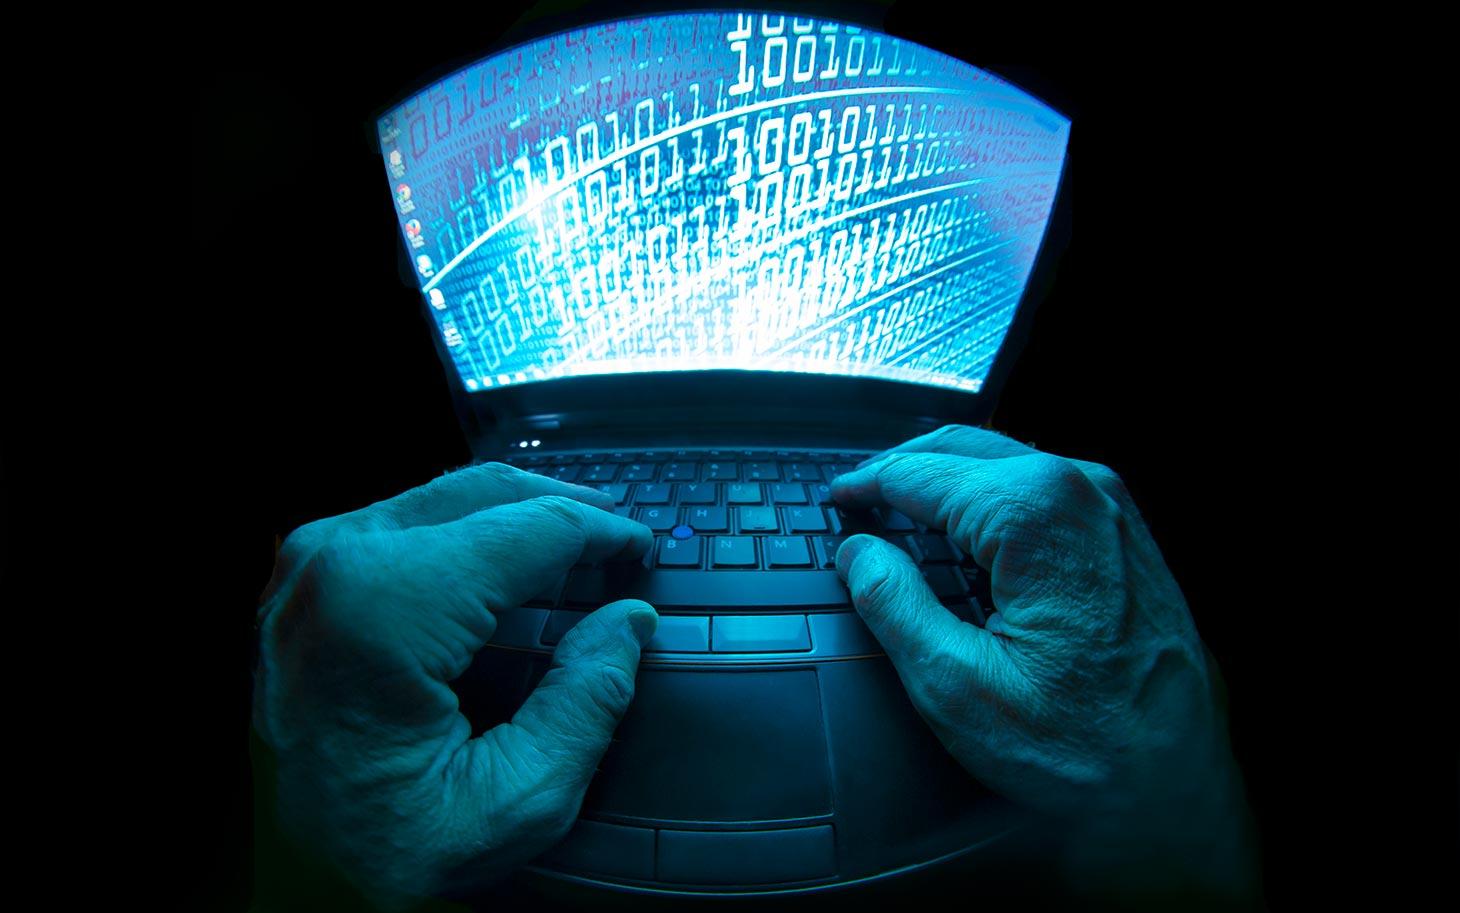 UK cybercrime attacks